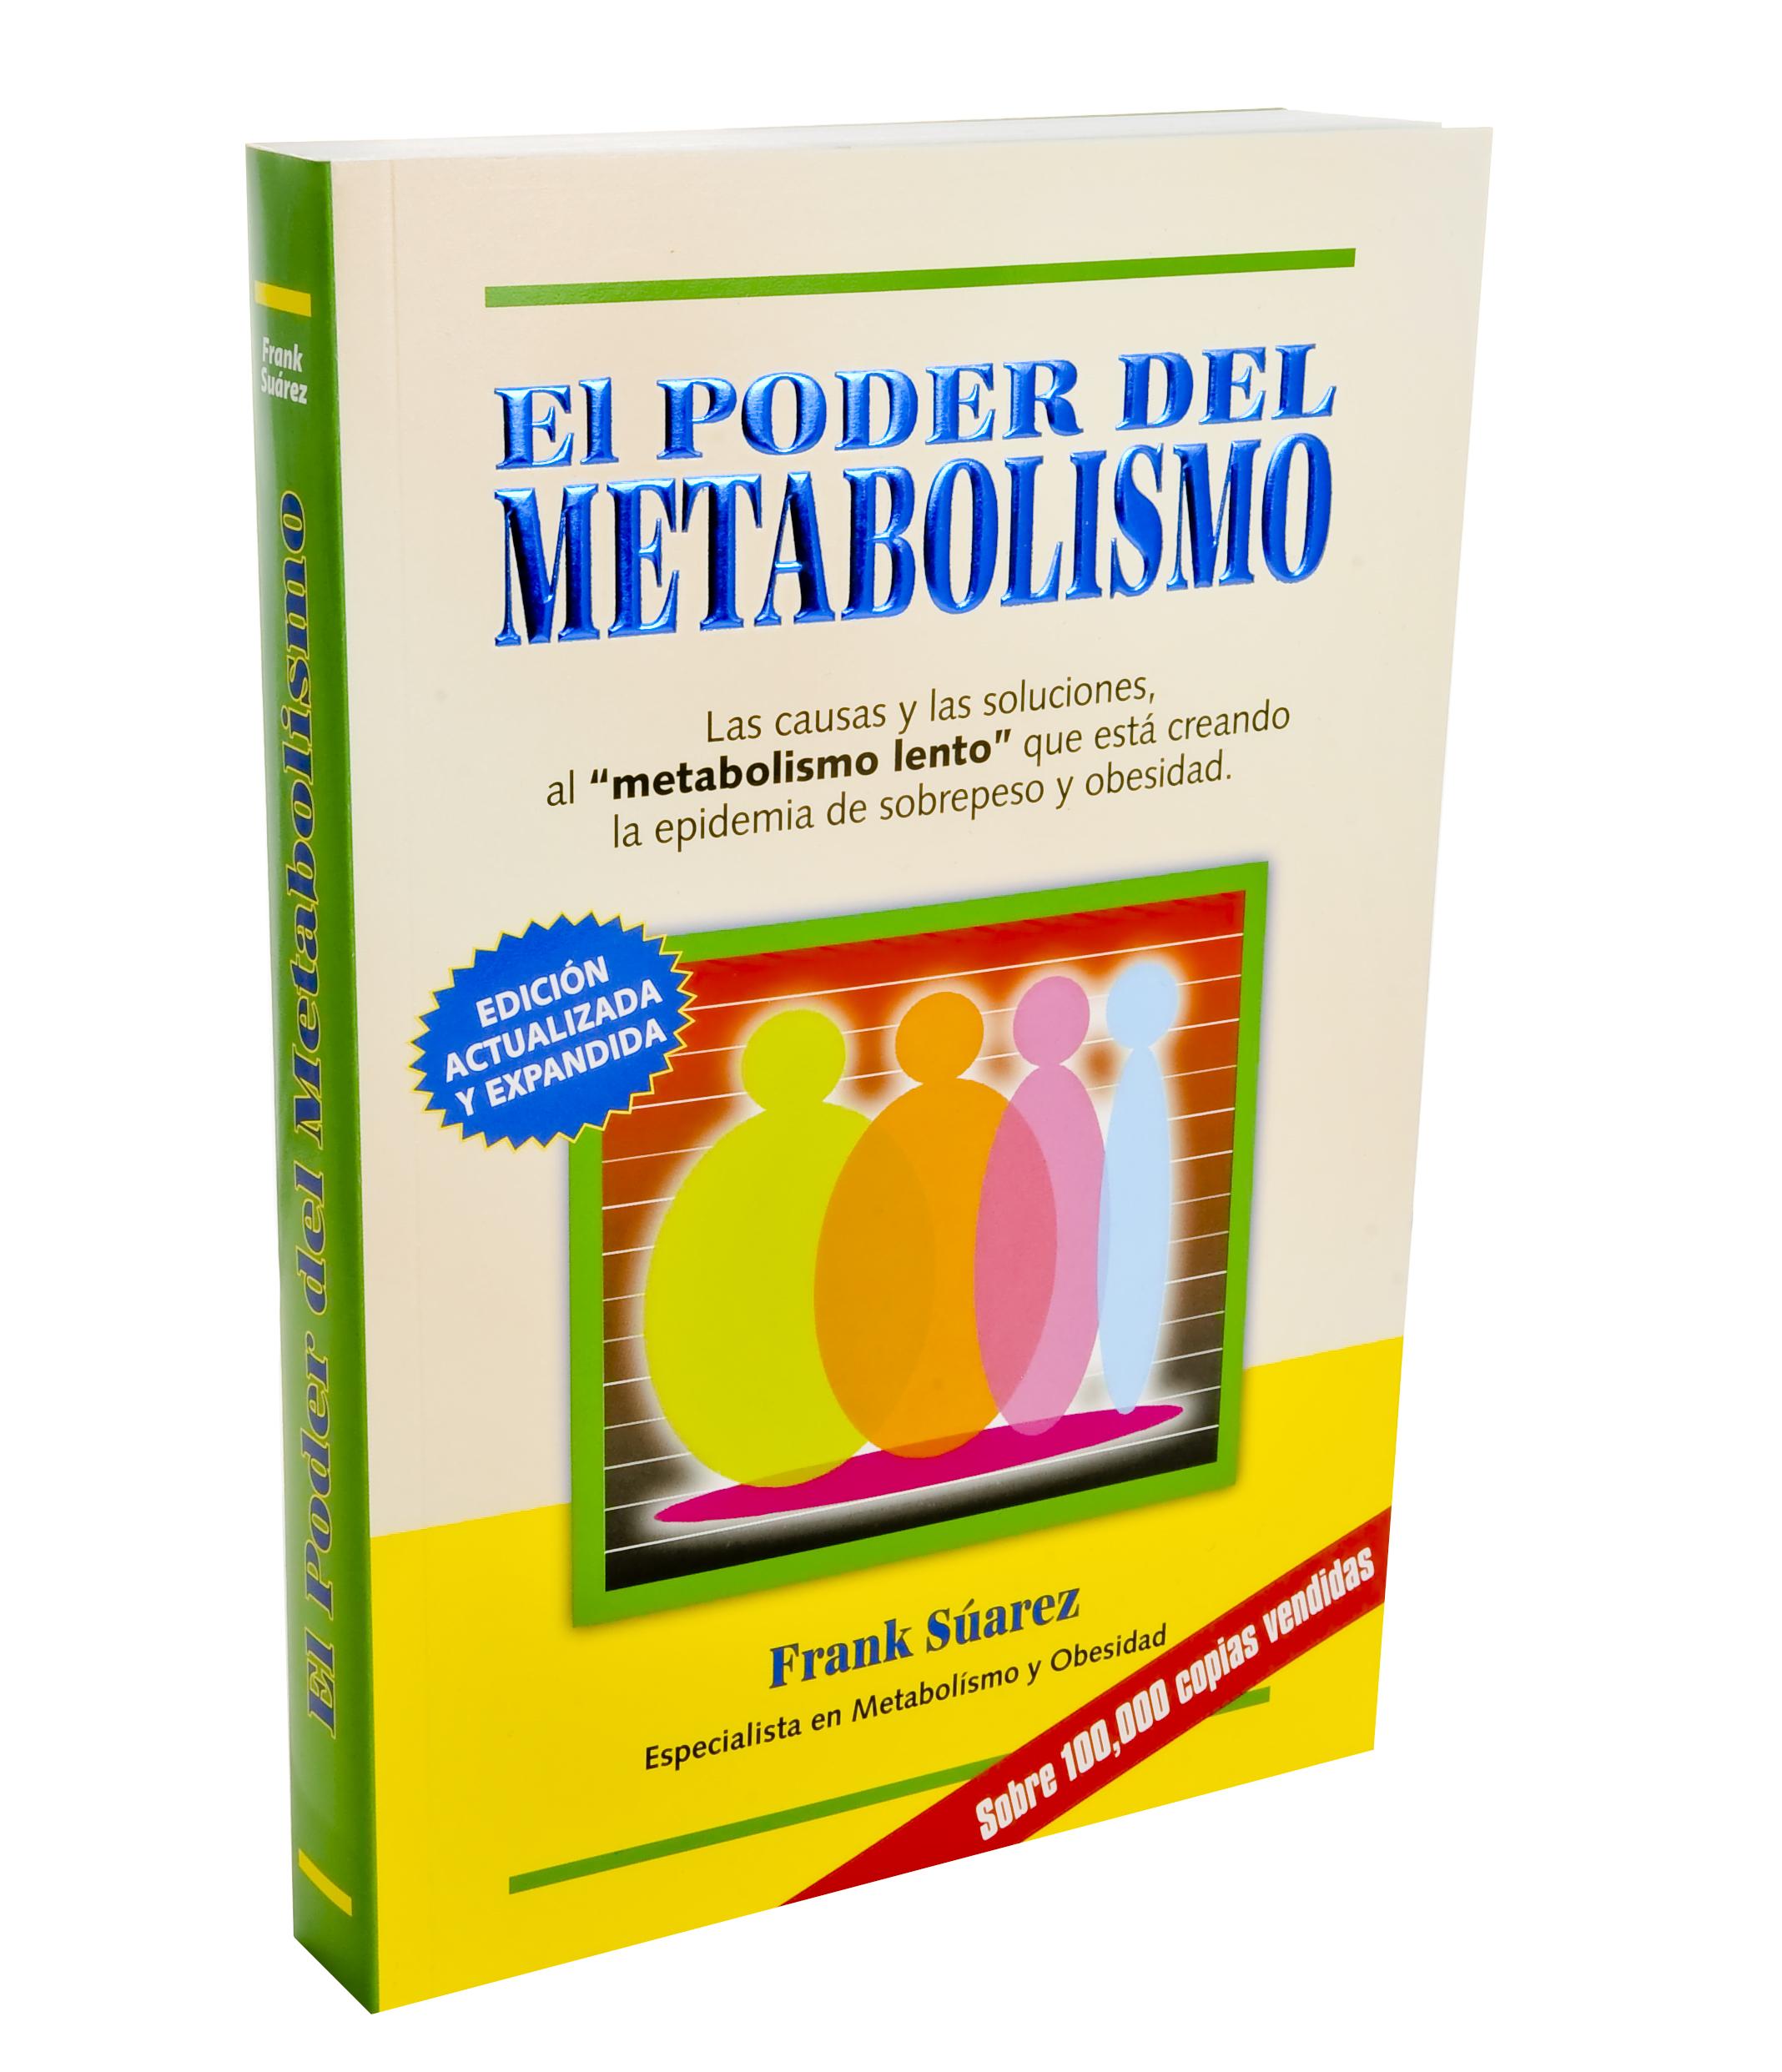 El Poder delMetabolismo